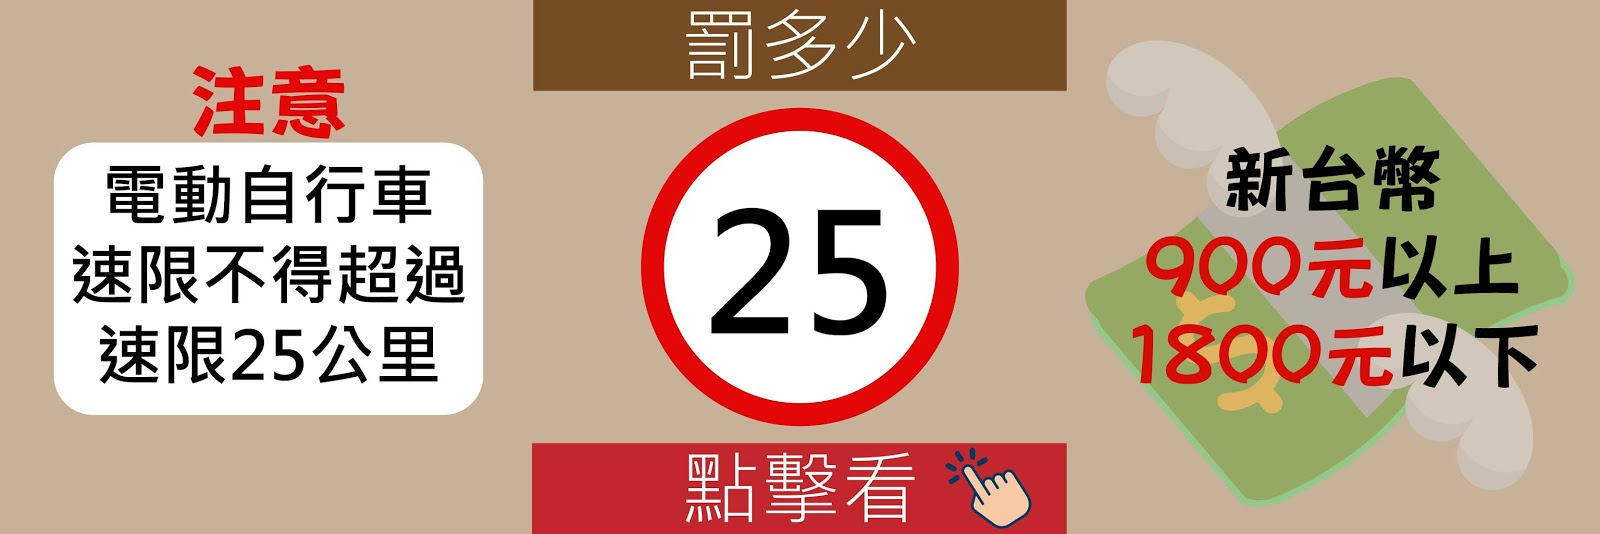 電動自行車罰款,超速25公里